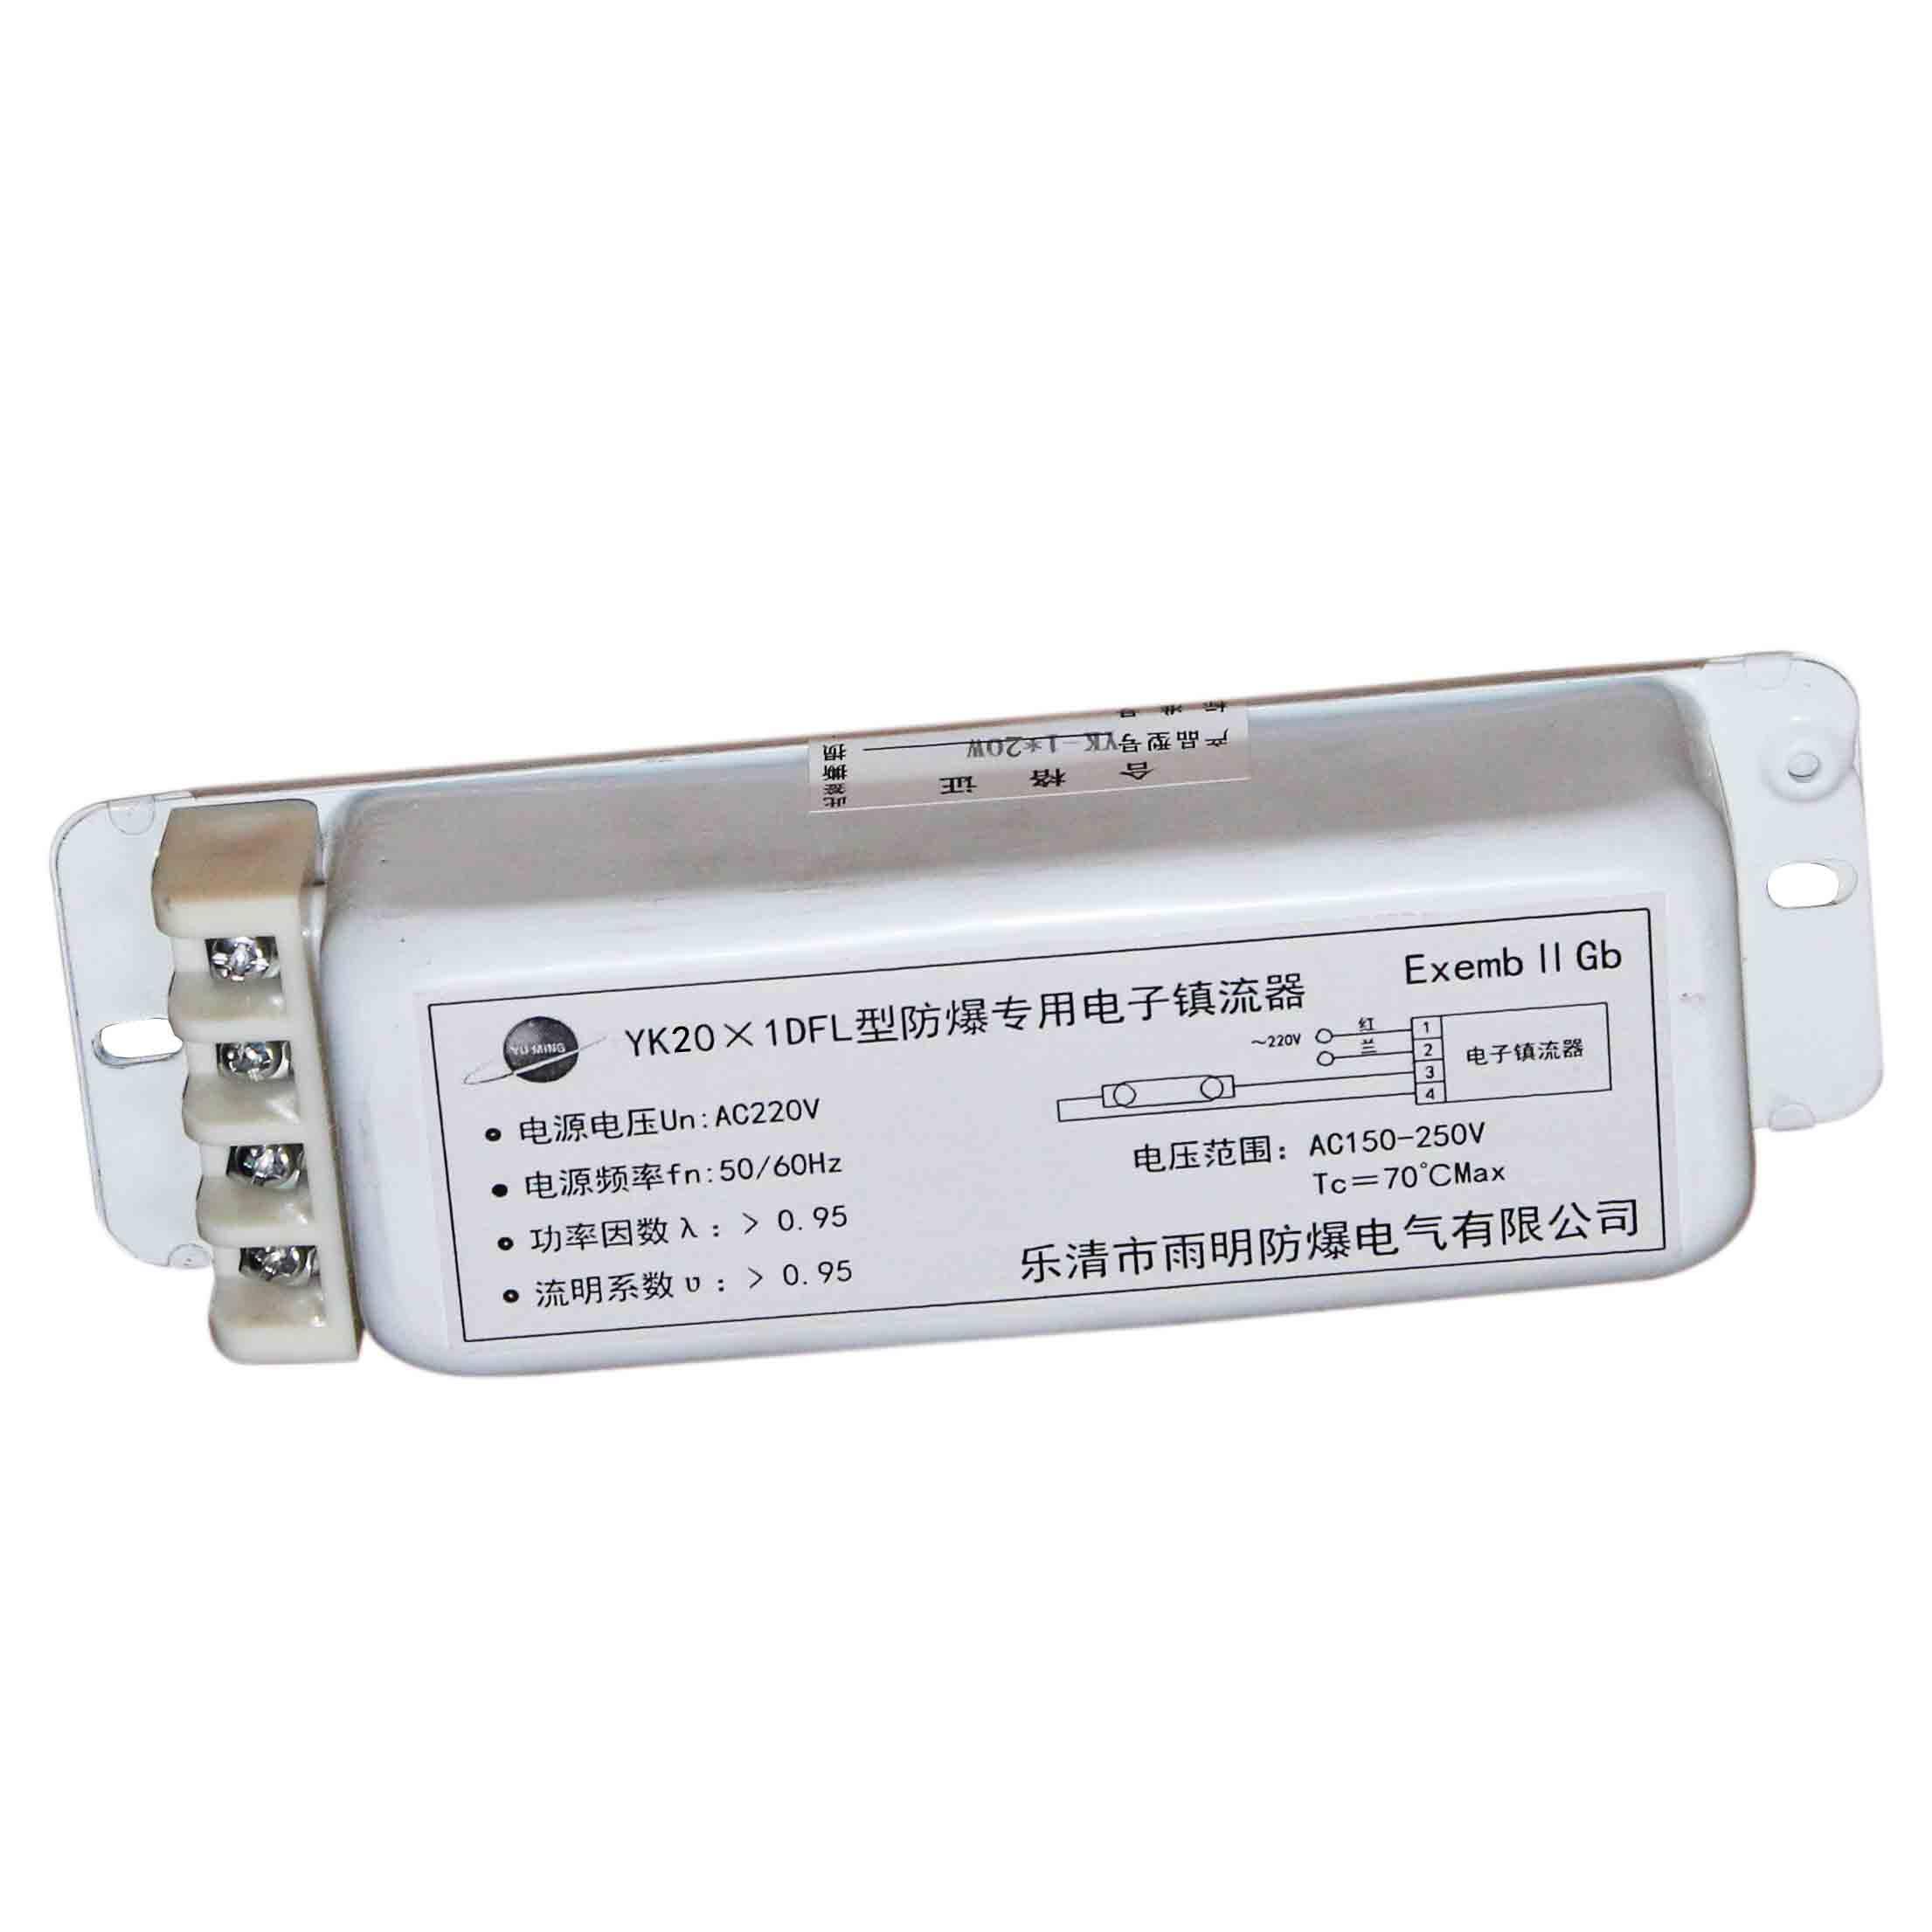 YK20-1DFL高效节能单脚荧光灯防爆电子镇流器 型号规格:YK20-1DFL型 产品名称:高效节能单脚专用电子镇流器 品 牌:雨明防爆 一、概 况 荧光灯电子镇流器问世于八十年代初,由荷兰飞利浦公司首先研制成功。由于它与传统的电感式镇流器相比,特别在电性能上更有独特之处。所以电子镇流器是具有强大的生命力。 荧光灯电子镇流器的电路设计有多种多样,在科学突飞猛进的今天,荧光灯电子镇流器的设计正趋向集成化或模块化,目的是使电路结构简单,电气性能更可靠,稳定,安全。 本公司研制生产的YK20-1DFL型高效